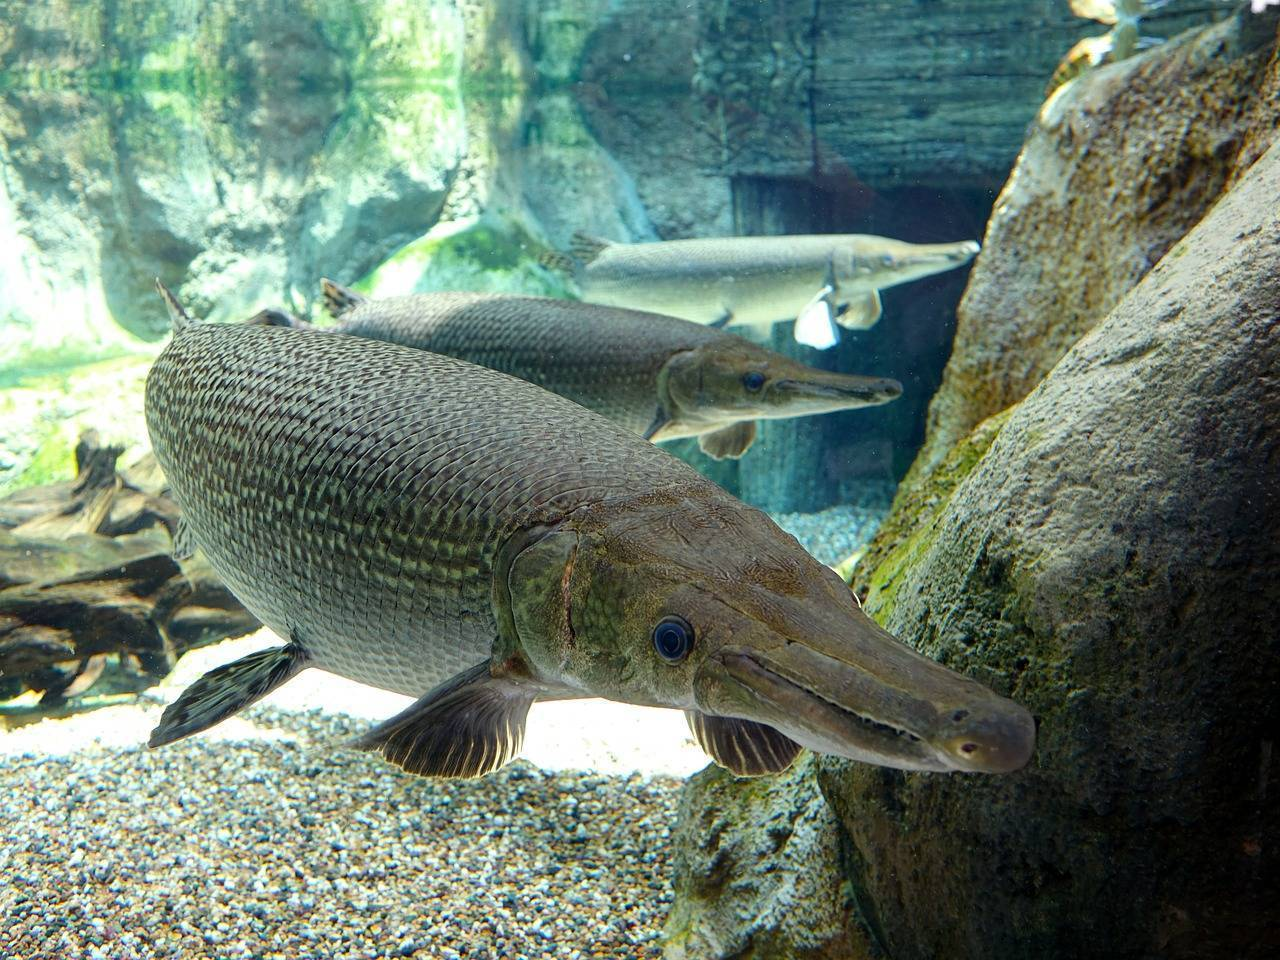 Рыба-аллигатор, или миссисипский панцирник